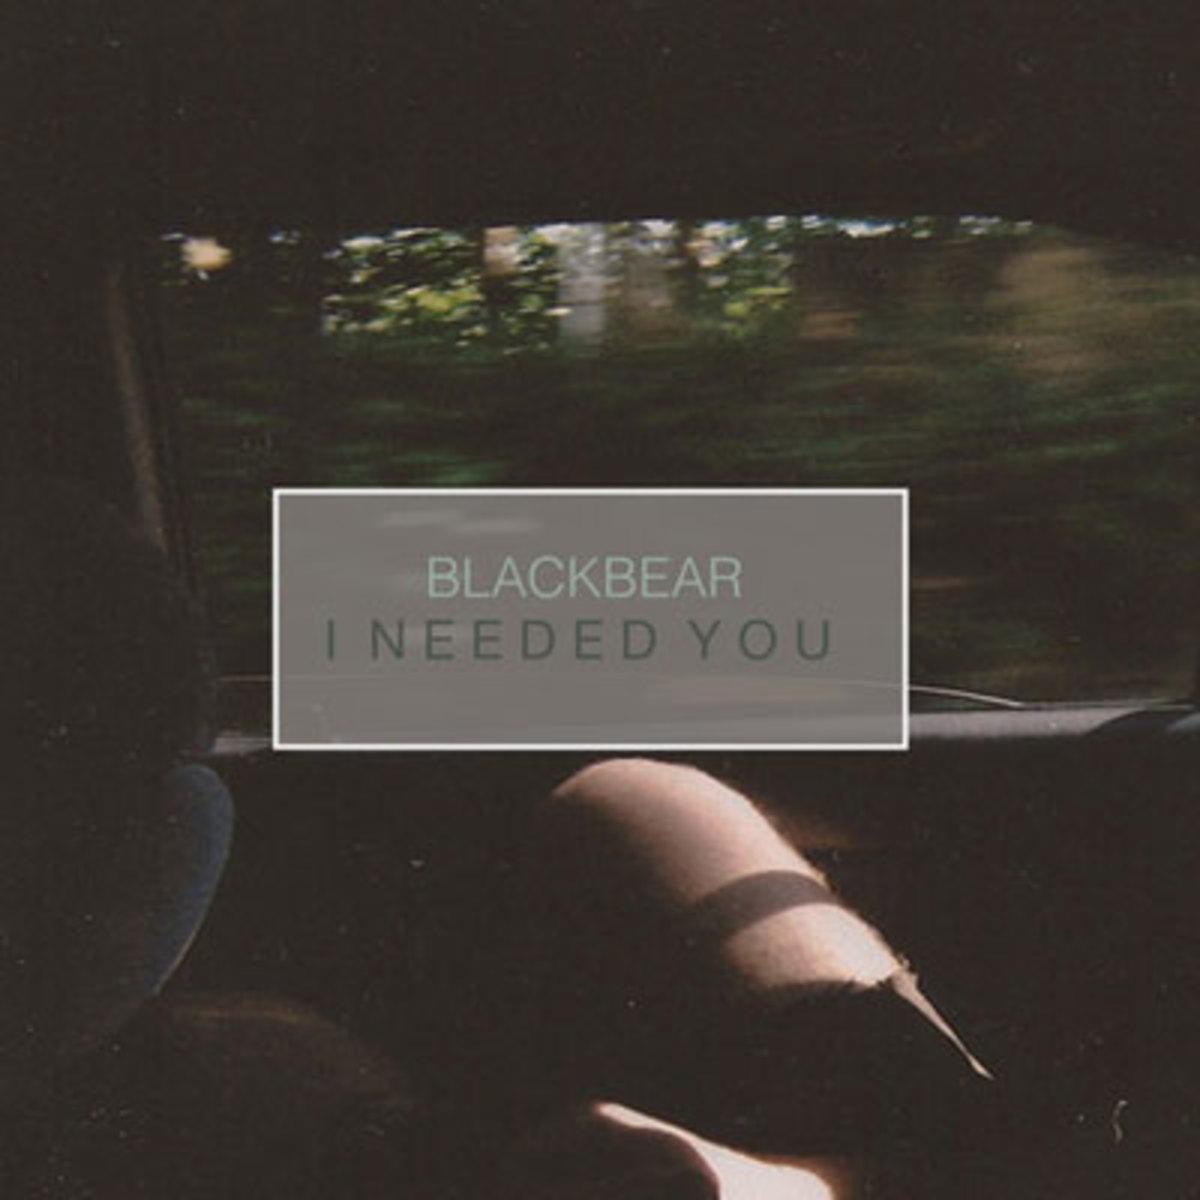 blackbear-ineededyou.jpg